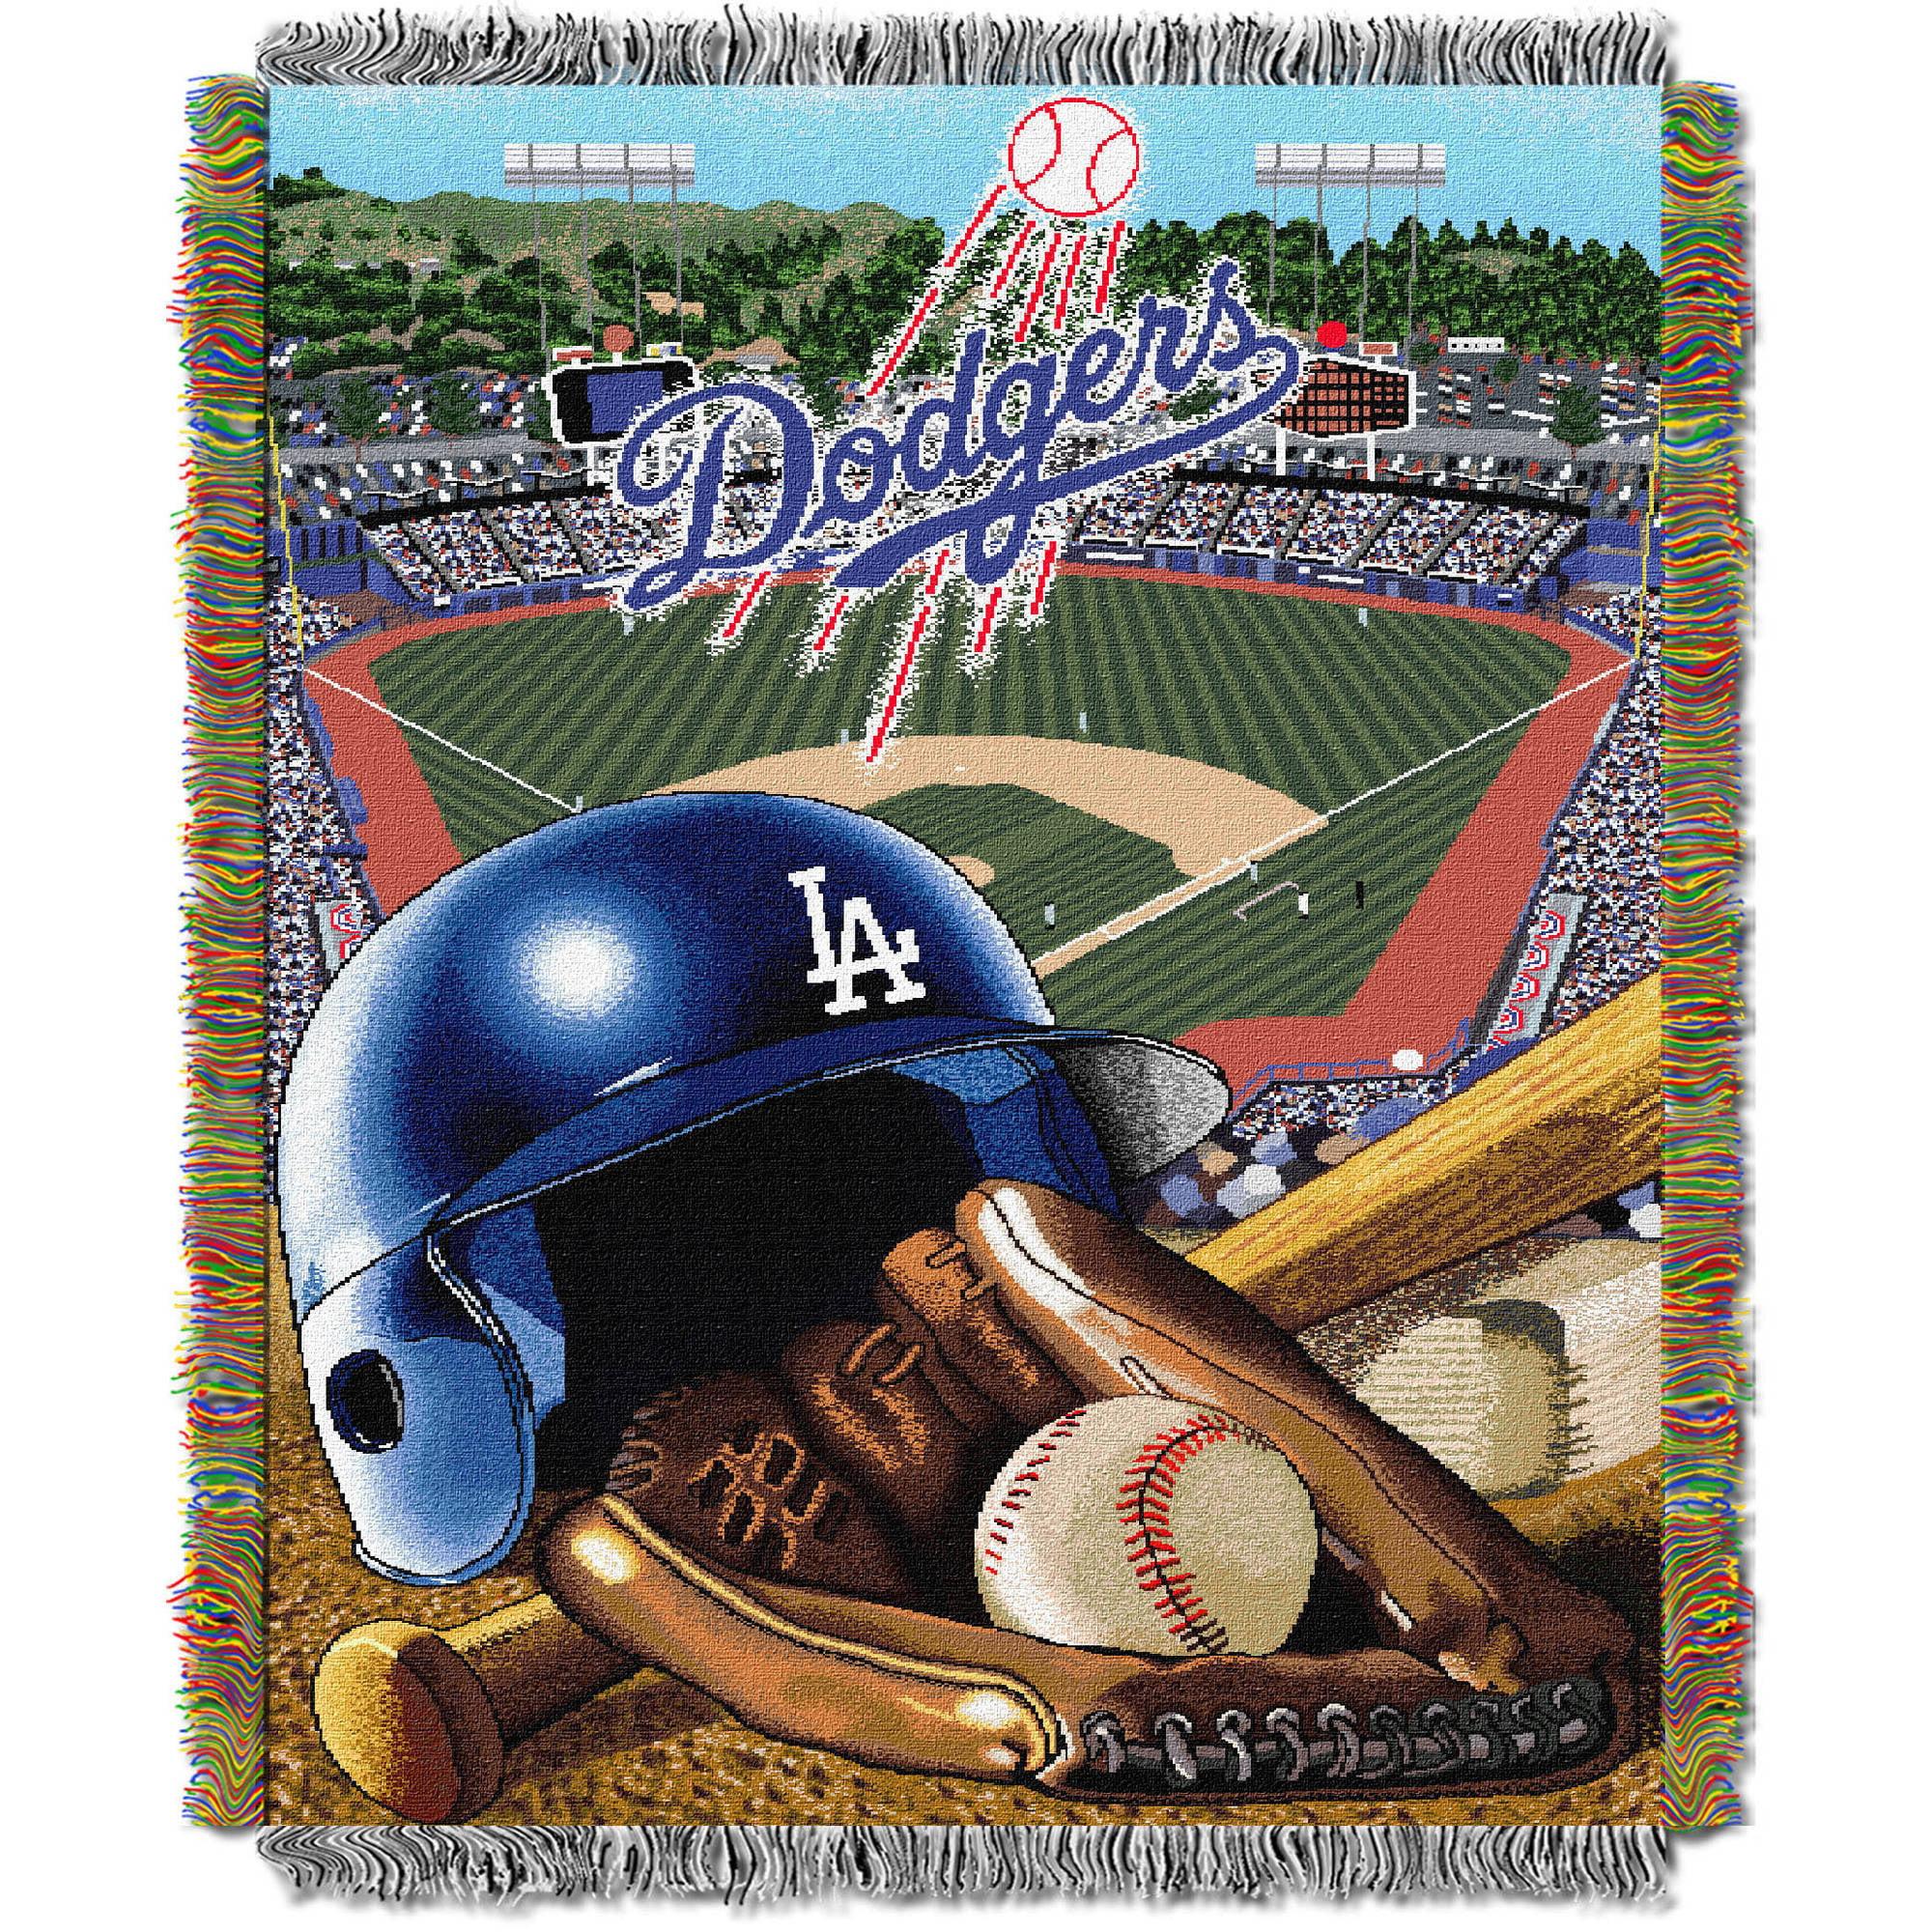 "MLB 48"" x 60"" Home Field Advantage Series Tapestry Throw, Dodgers"